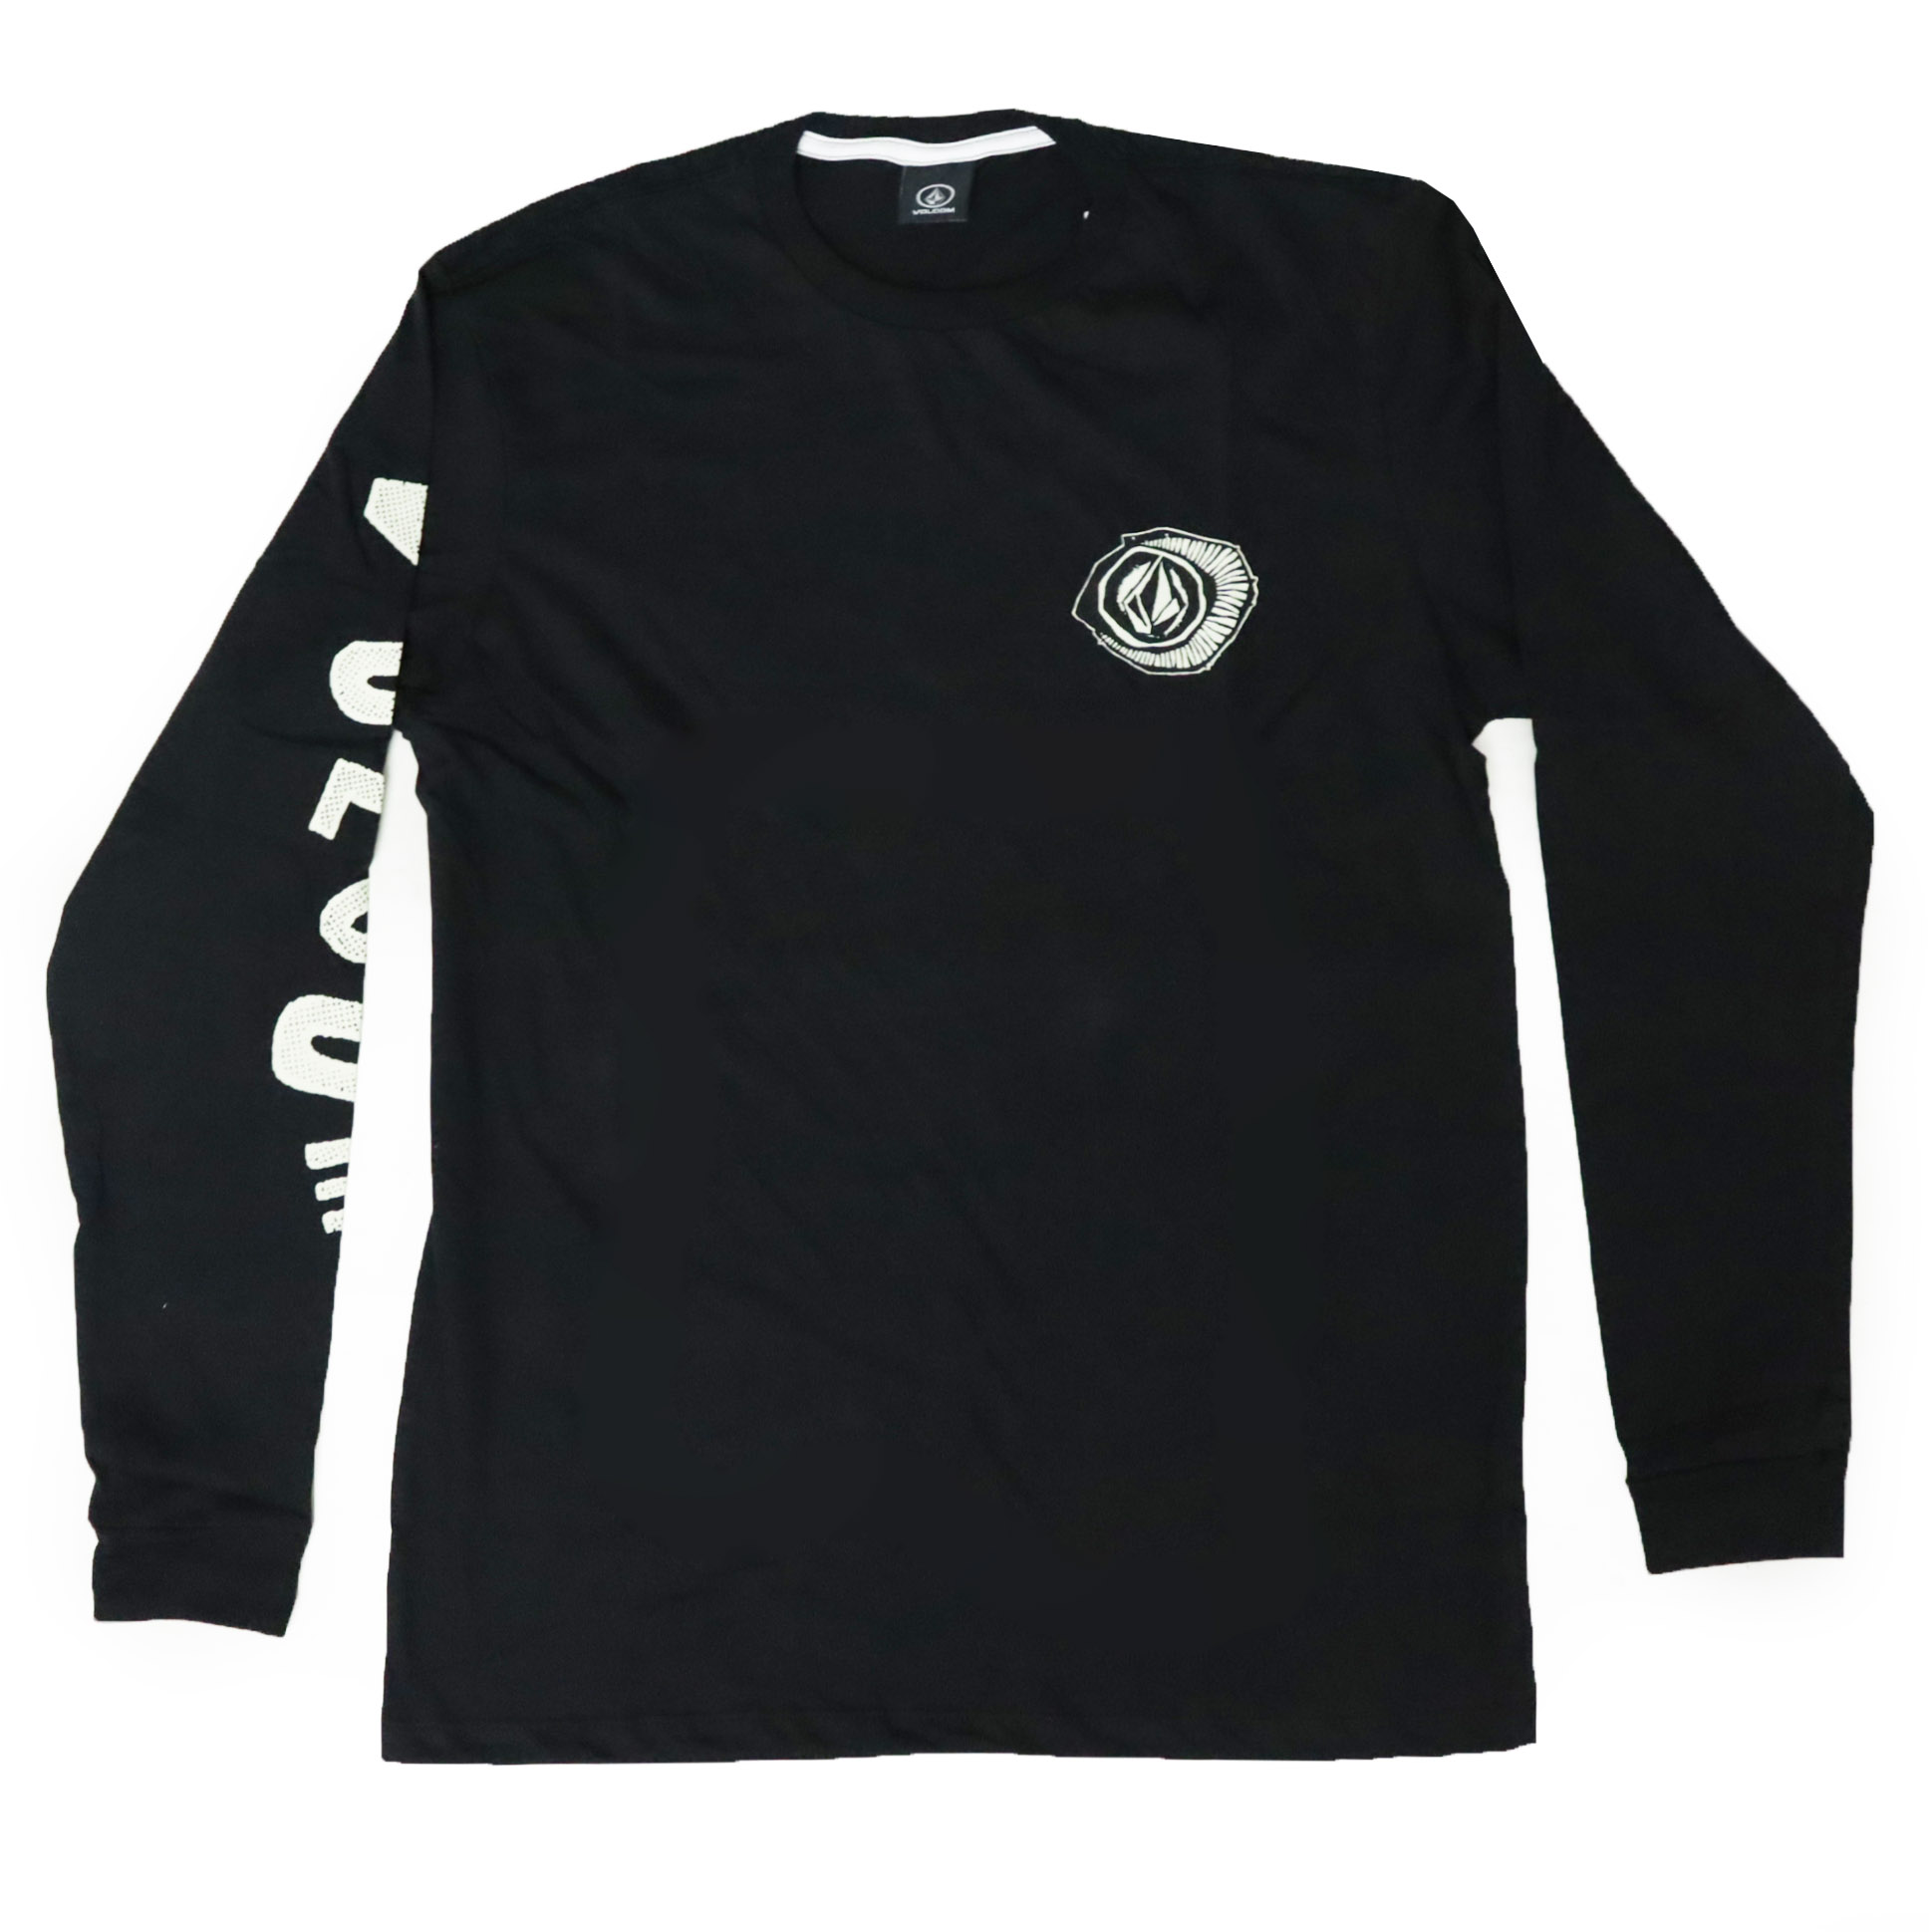 Camiseta Manga Longa Volcom Sick - Preto